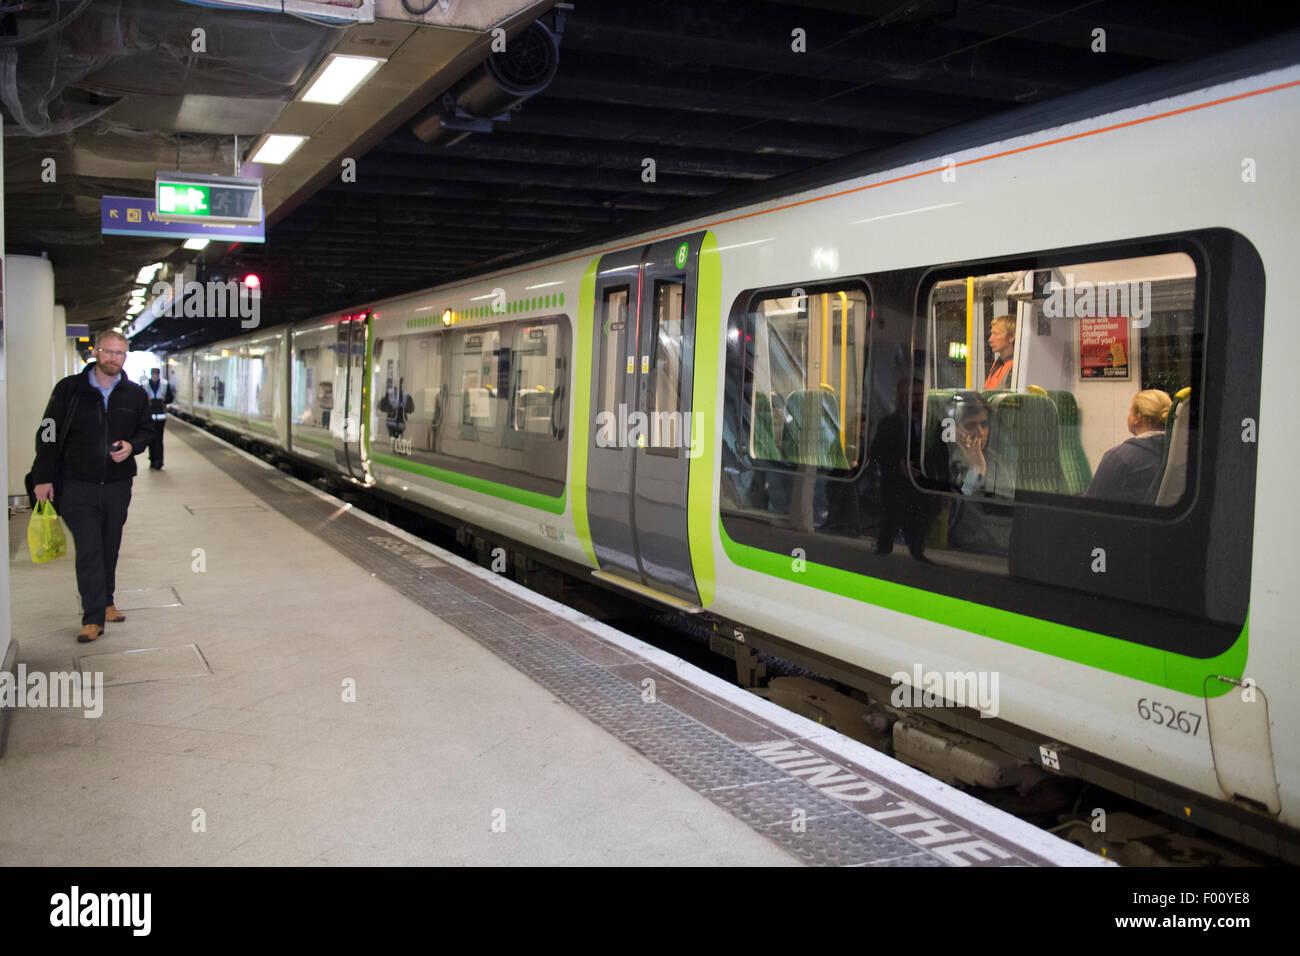 london midland train on the platform at birmingham new street station england uk - Stock Image